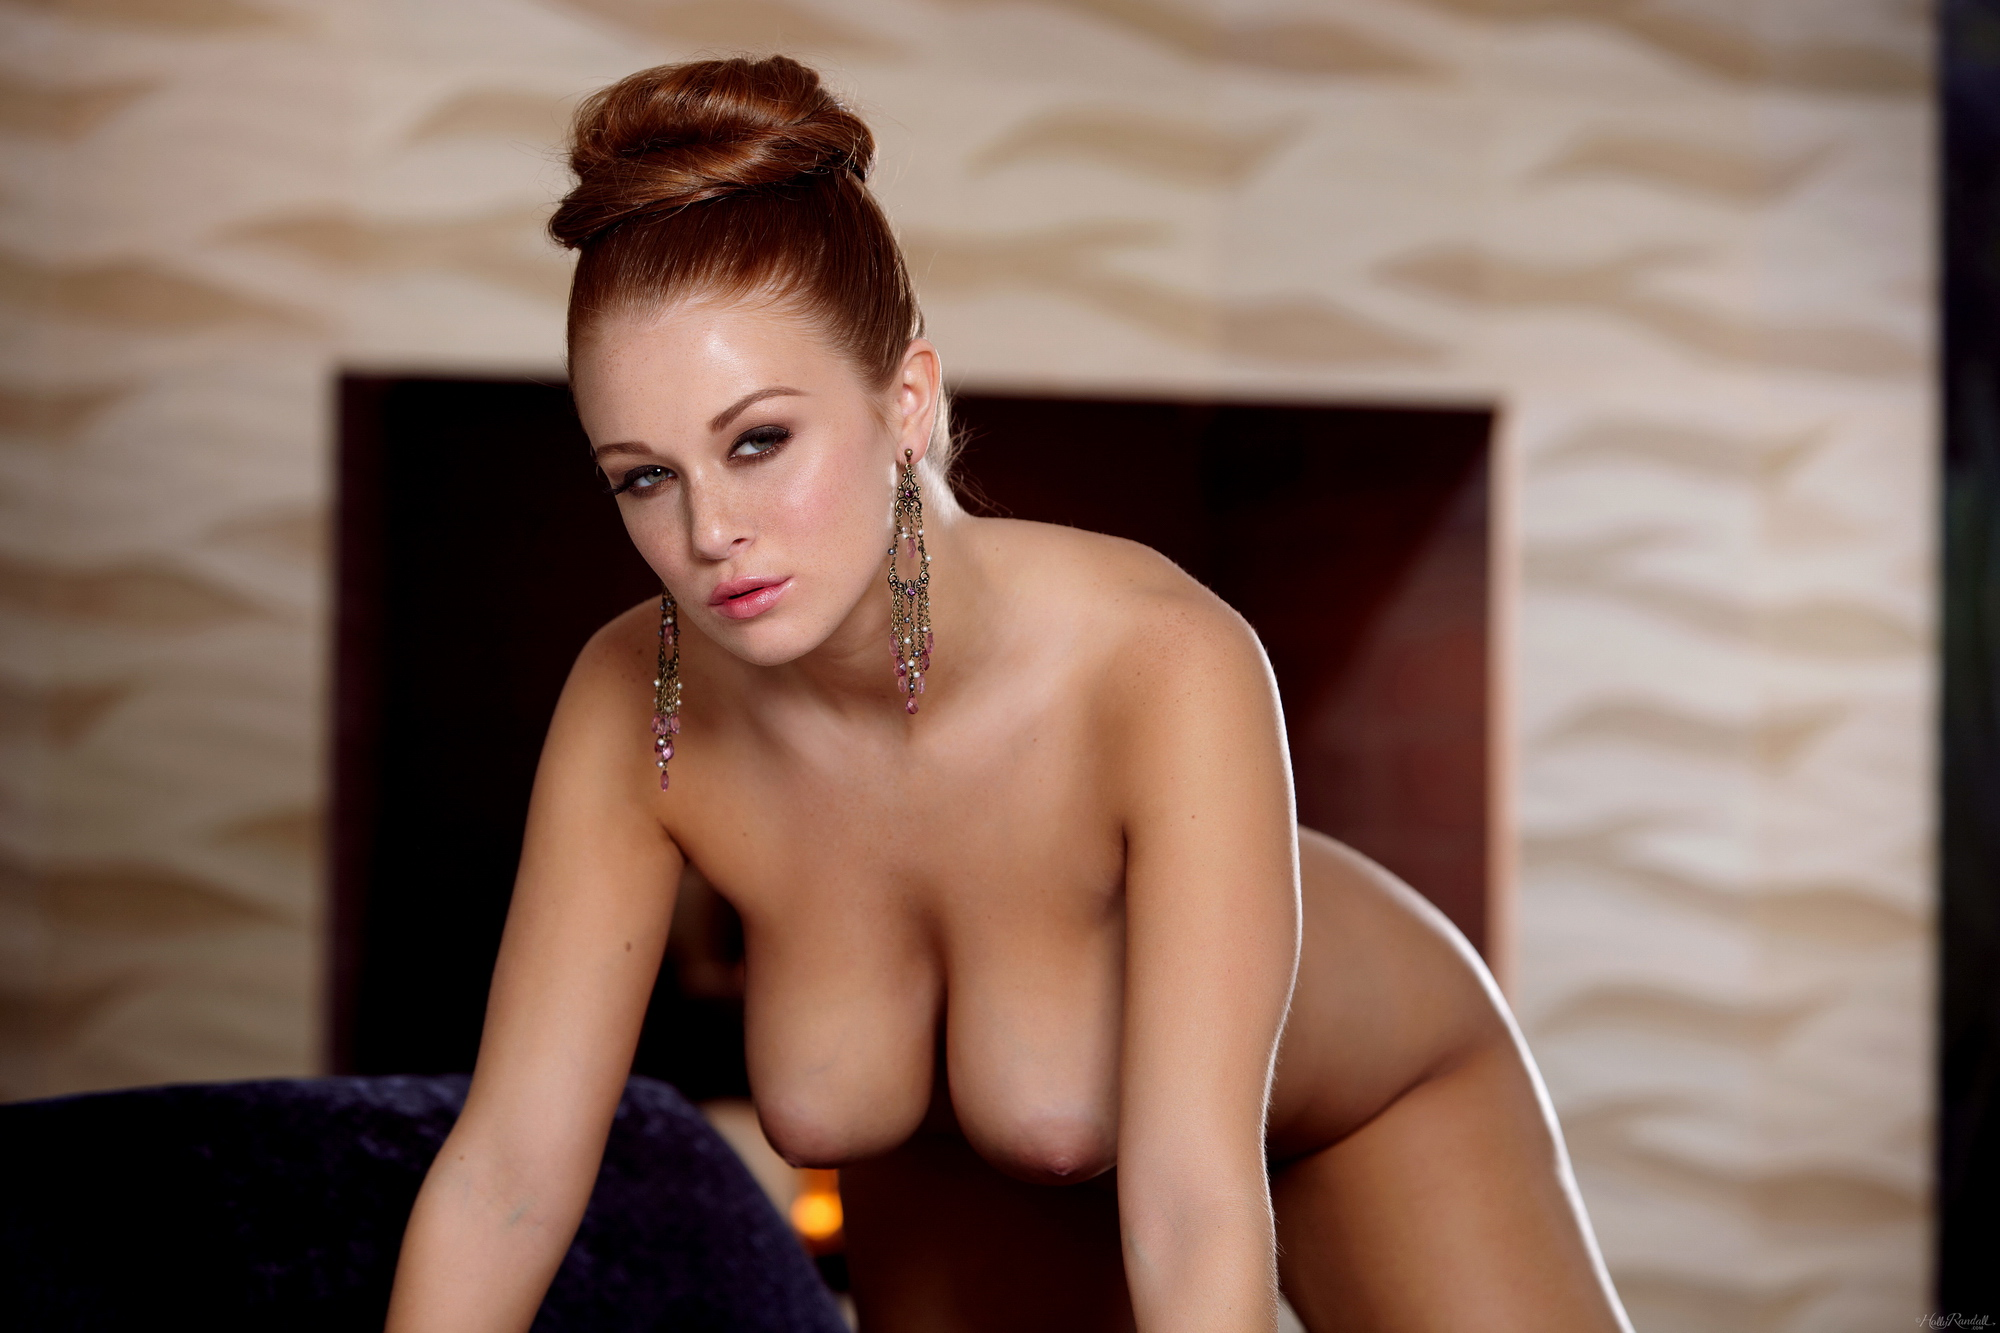 leanna-decker-nude-fireplace-redhead-hollyrandall-18